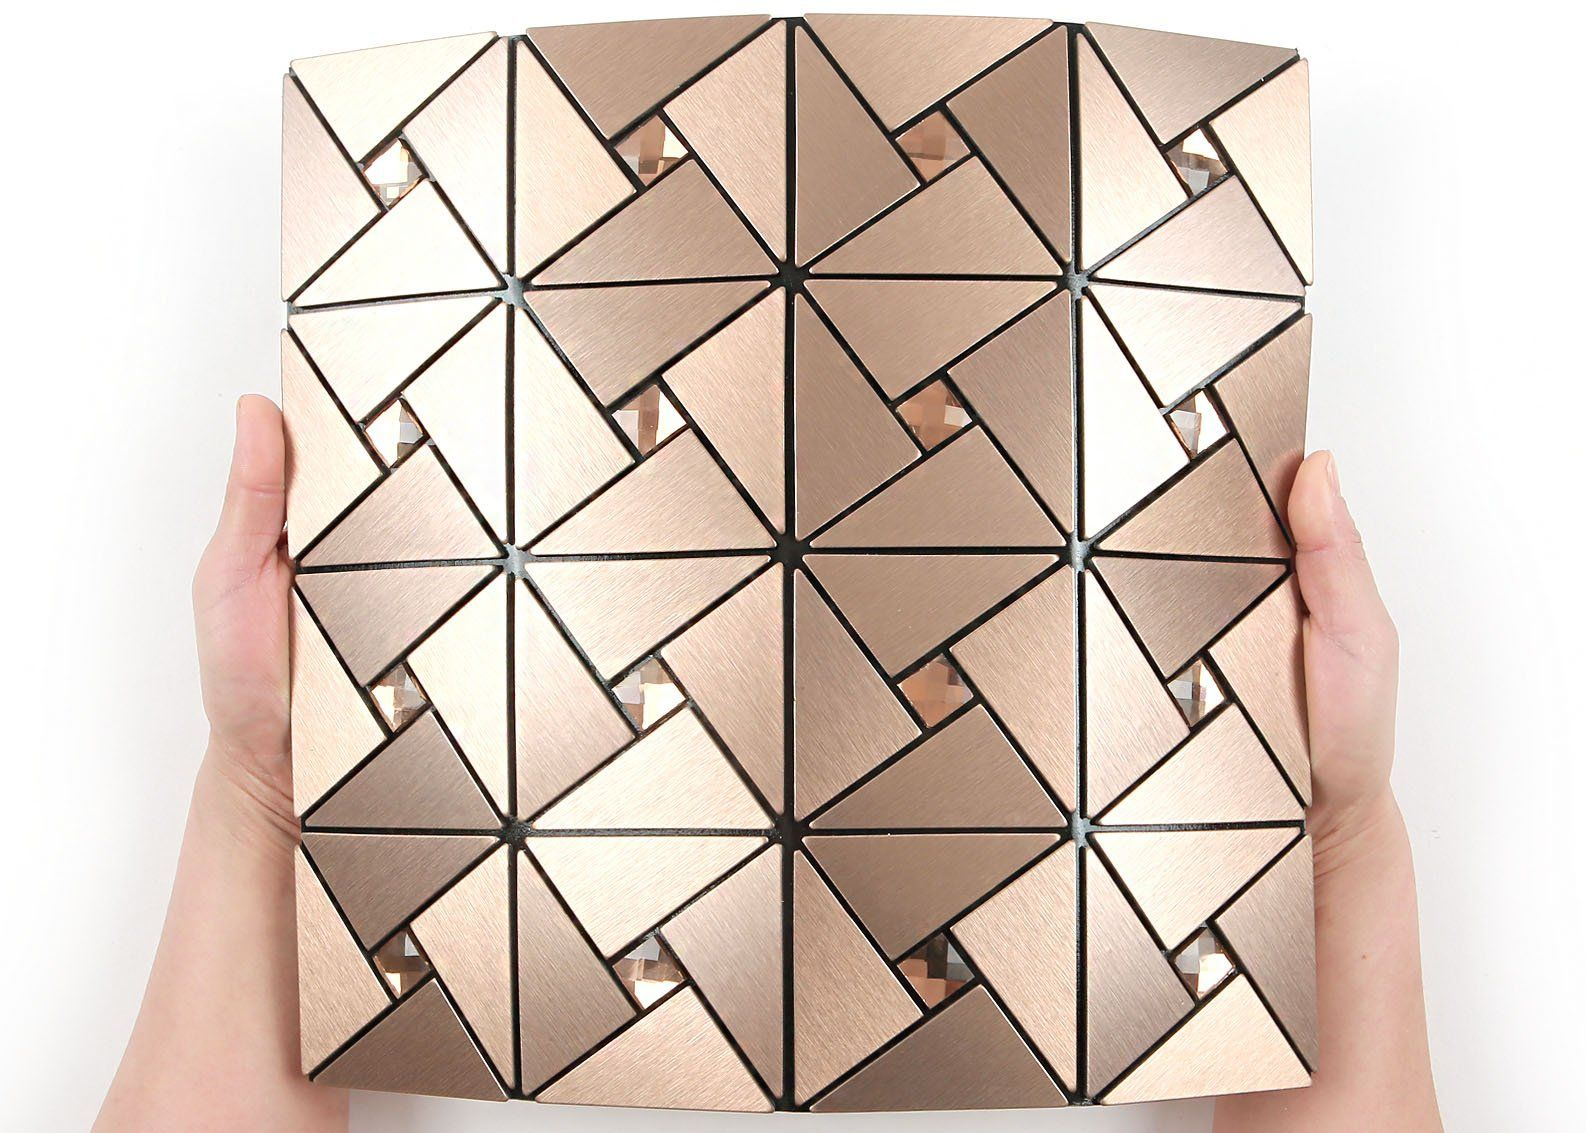 Roserosa Peel And Stick Tile Metal Backsplash For Kitchen Wall Tiles Aluminum Bronze Surface Me Peel And Stick Tile Metal Tile Backsplash Metallic Backsplash